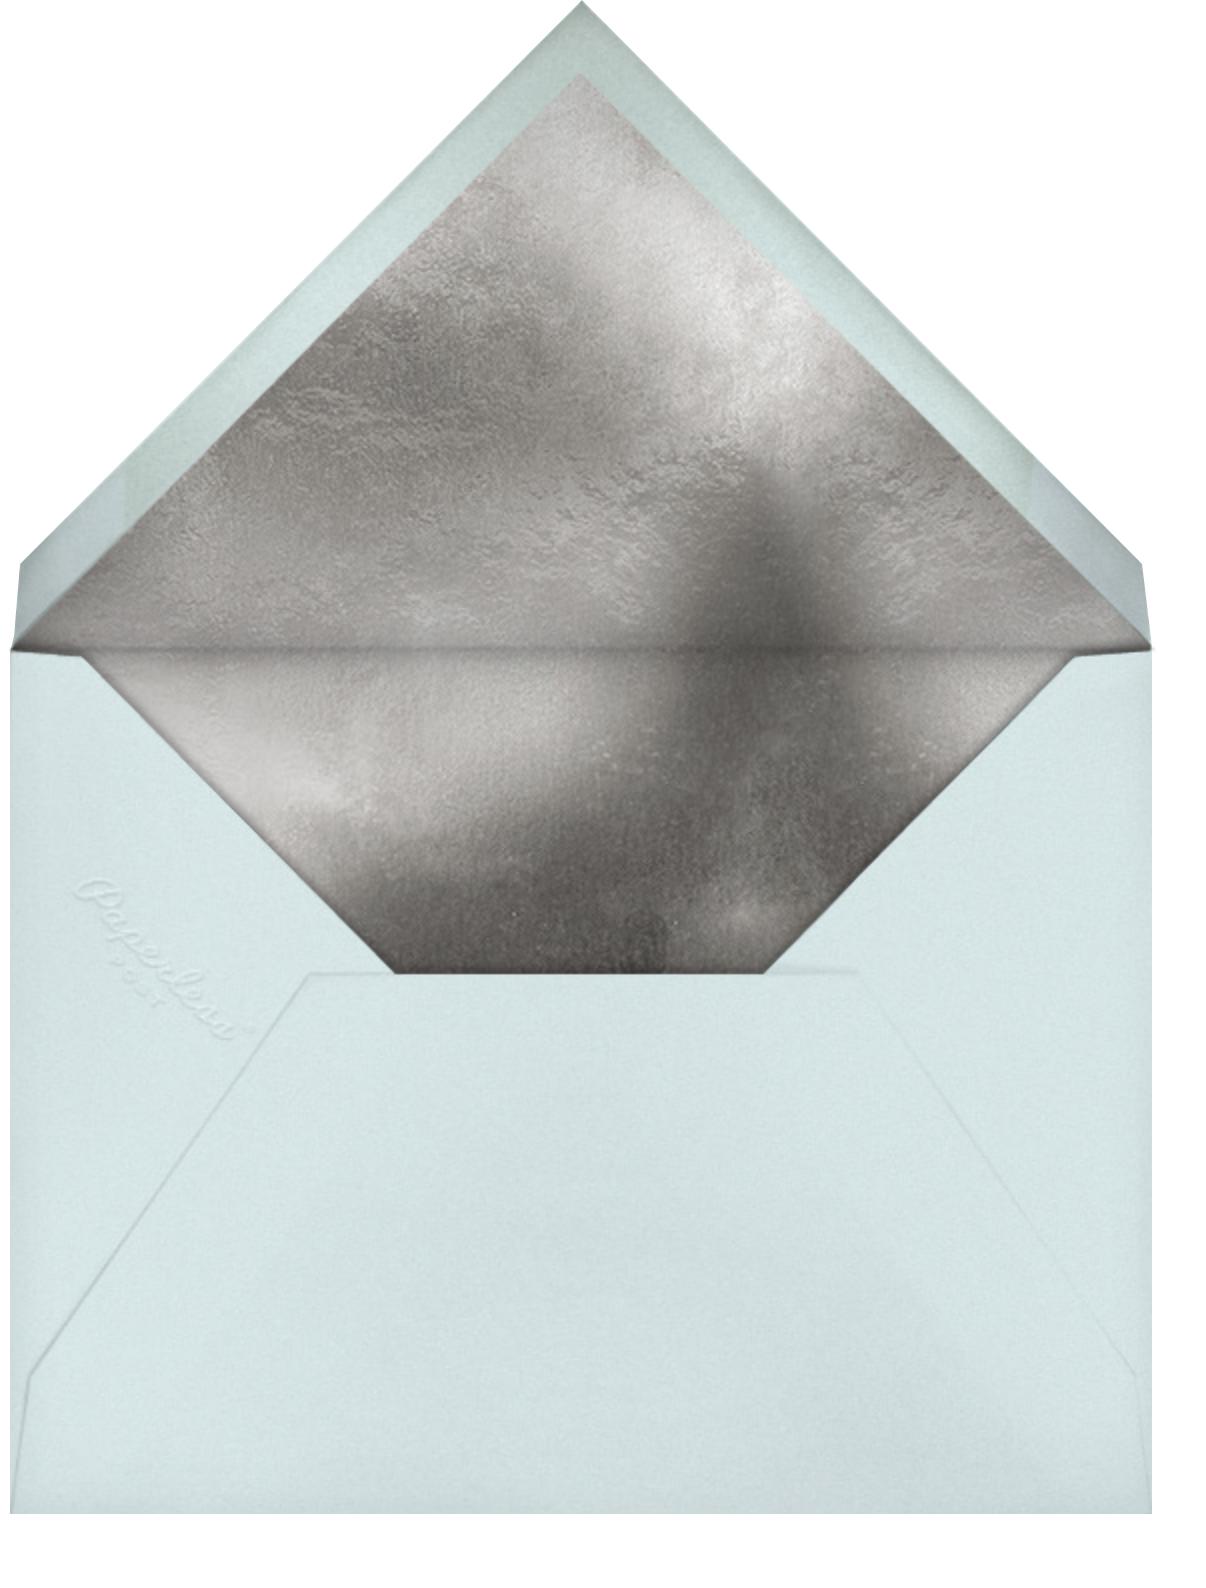 Fetti - Blue - Kelly Wearstler - Hanukkah - envelope back